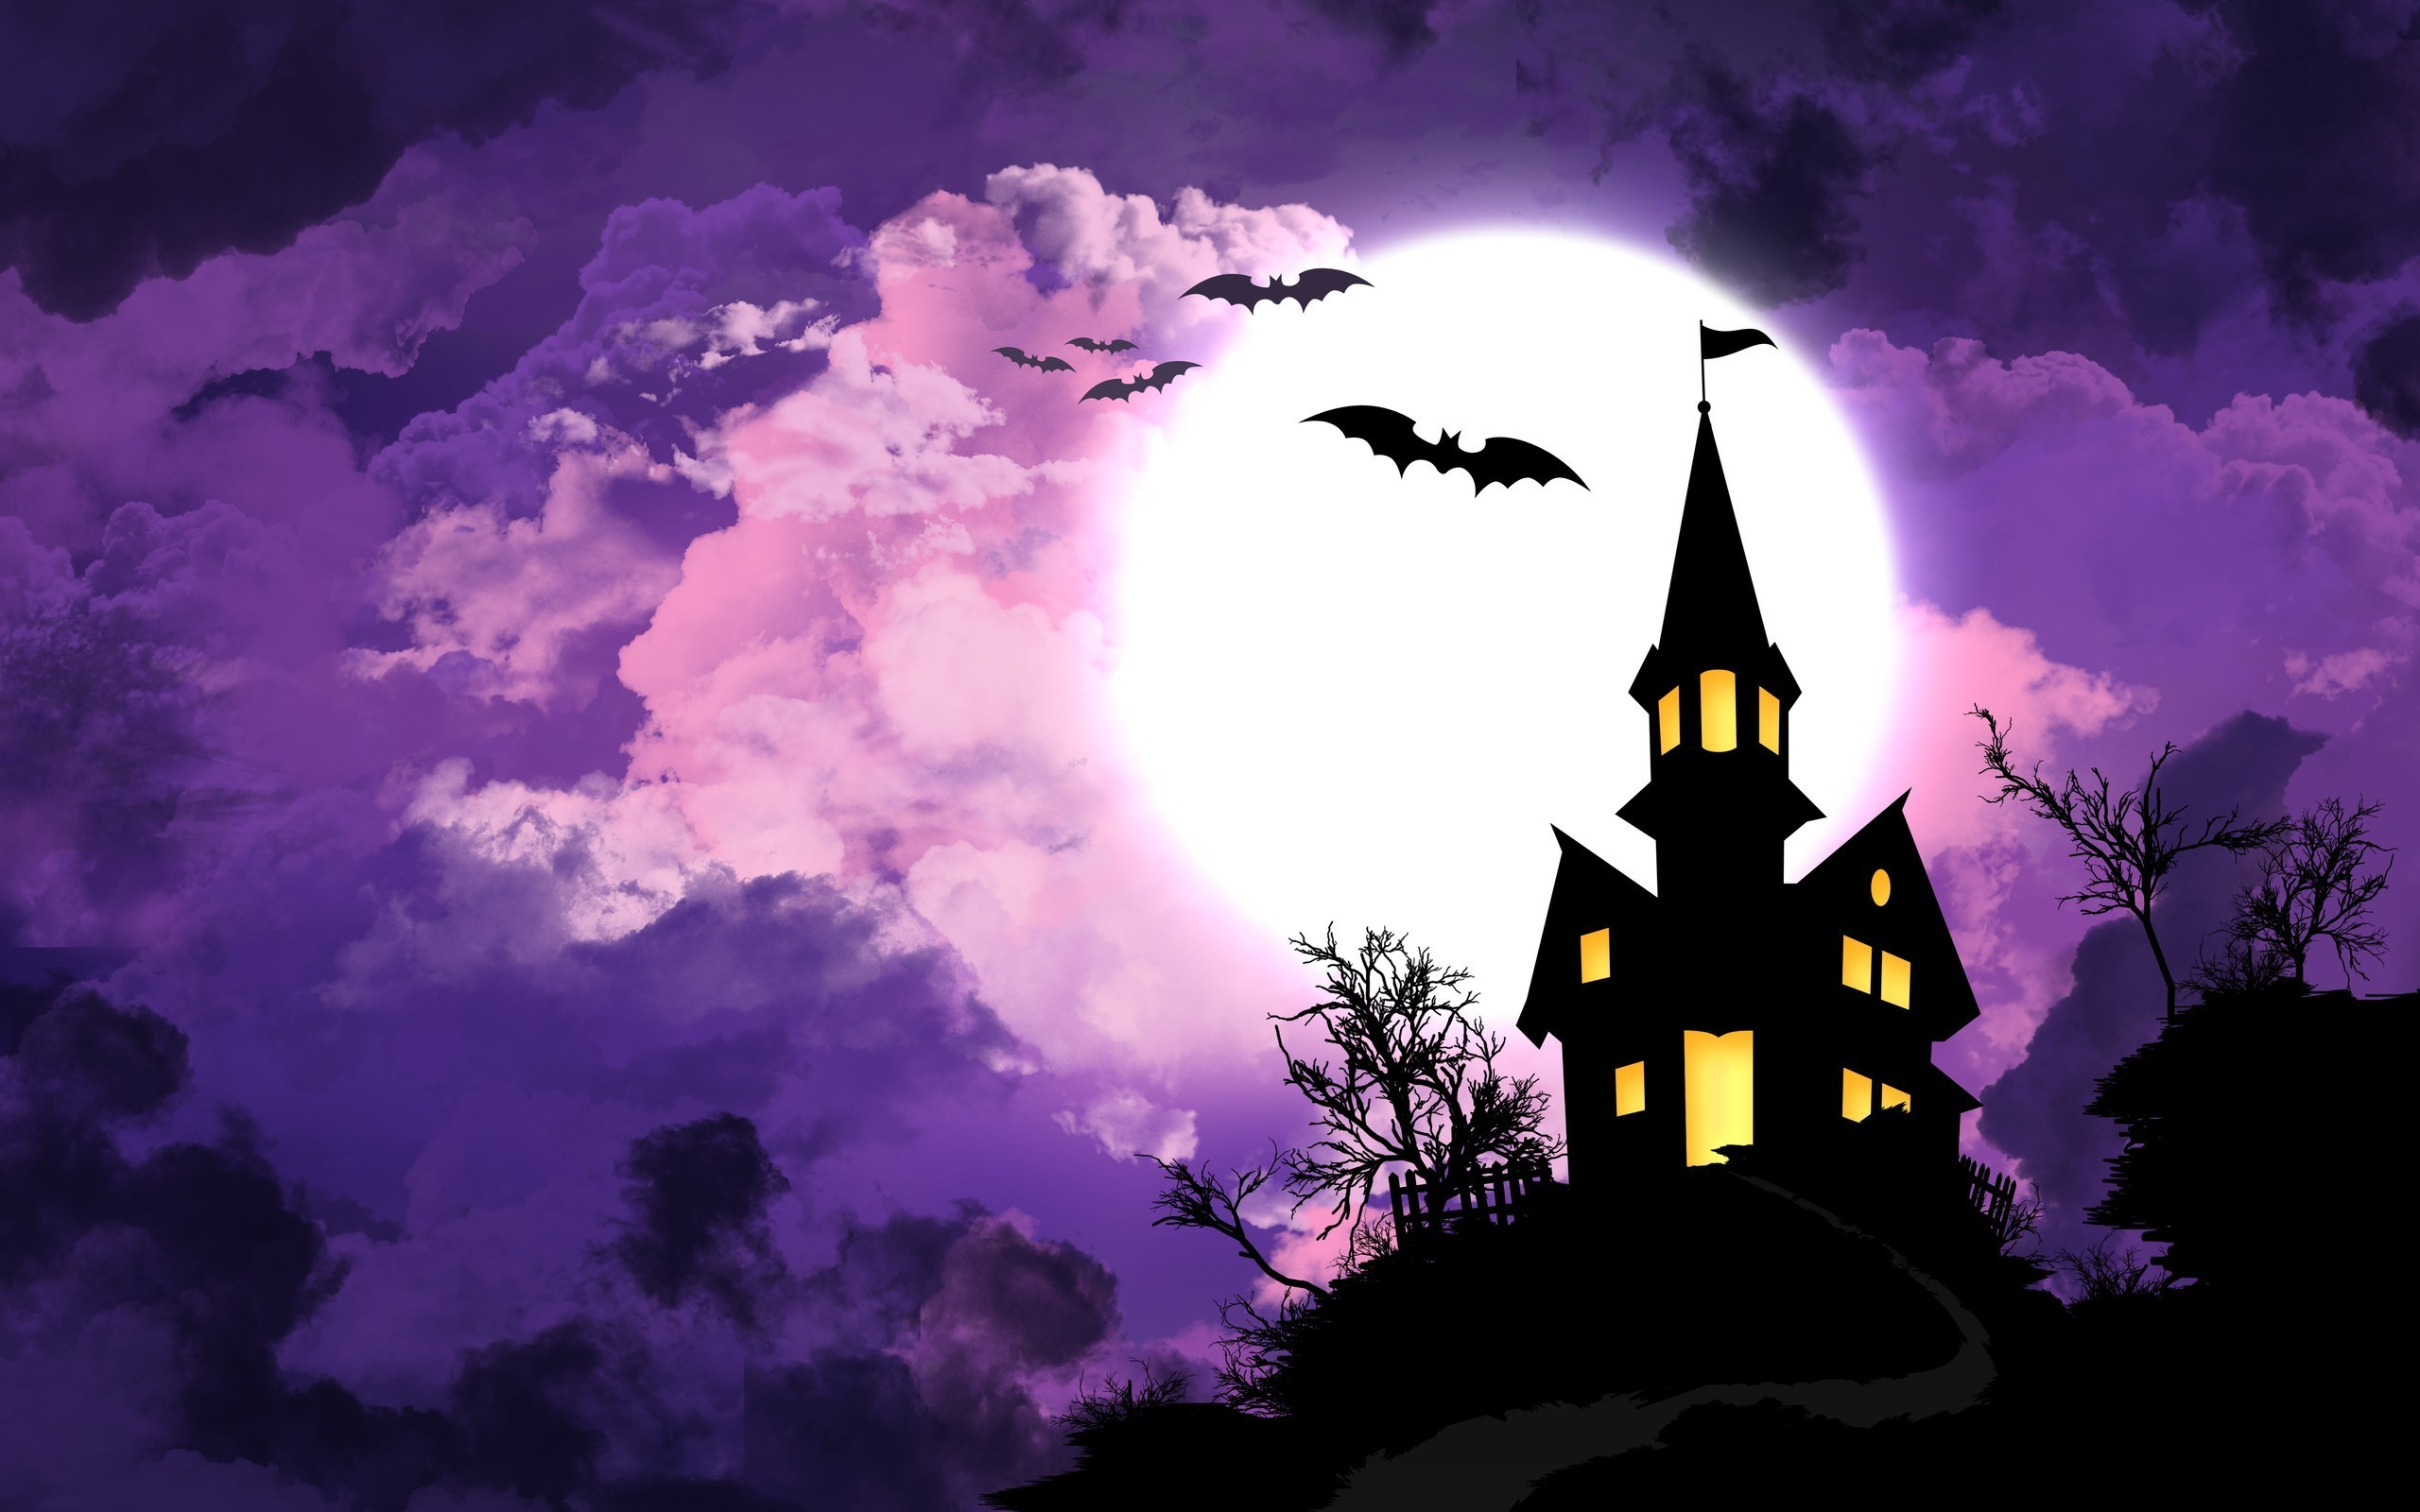 Halloween Spooky Wallpaper.Halloween Spooky House Wallpaper 2560x1600 26466